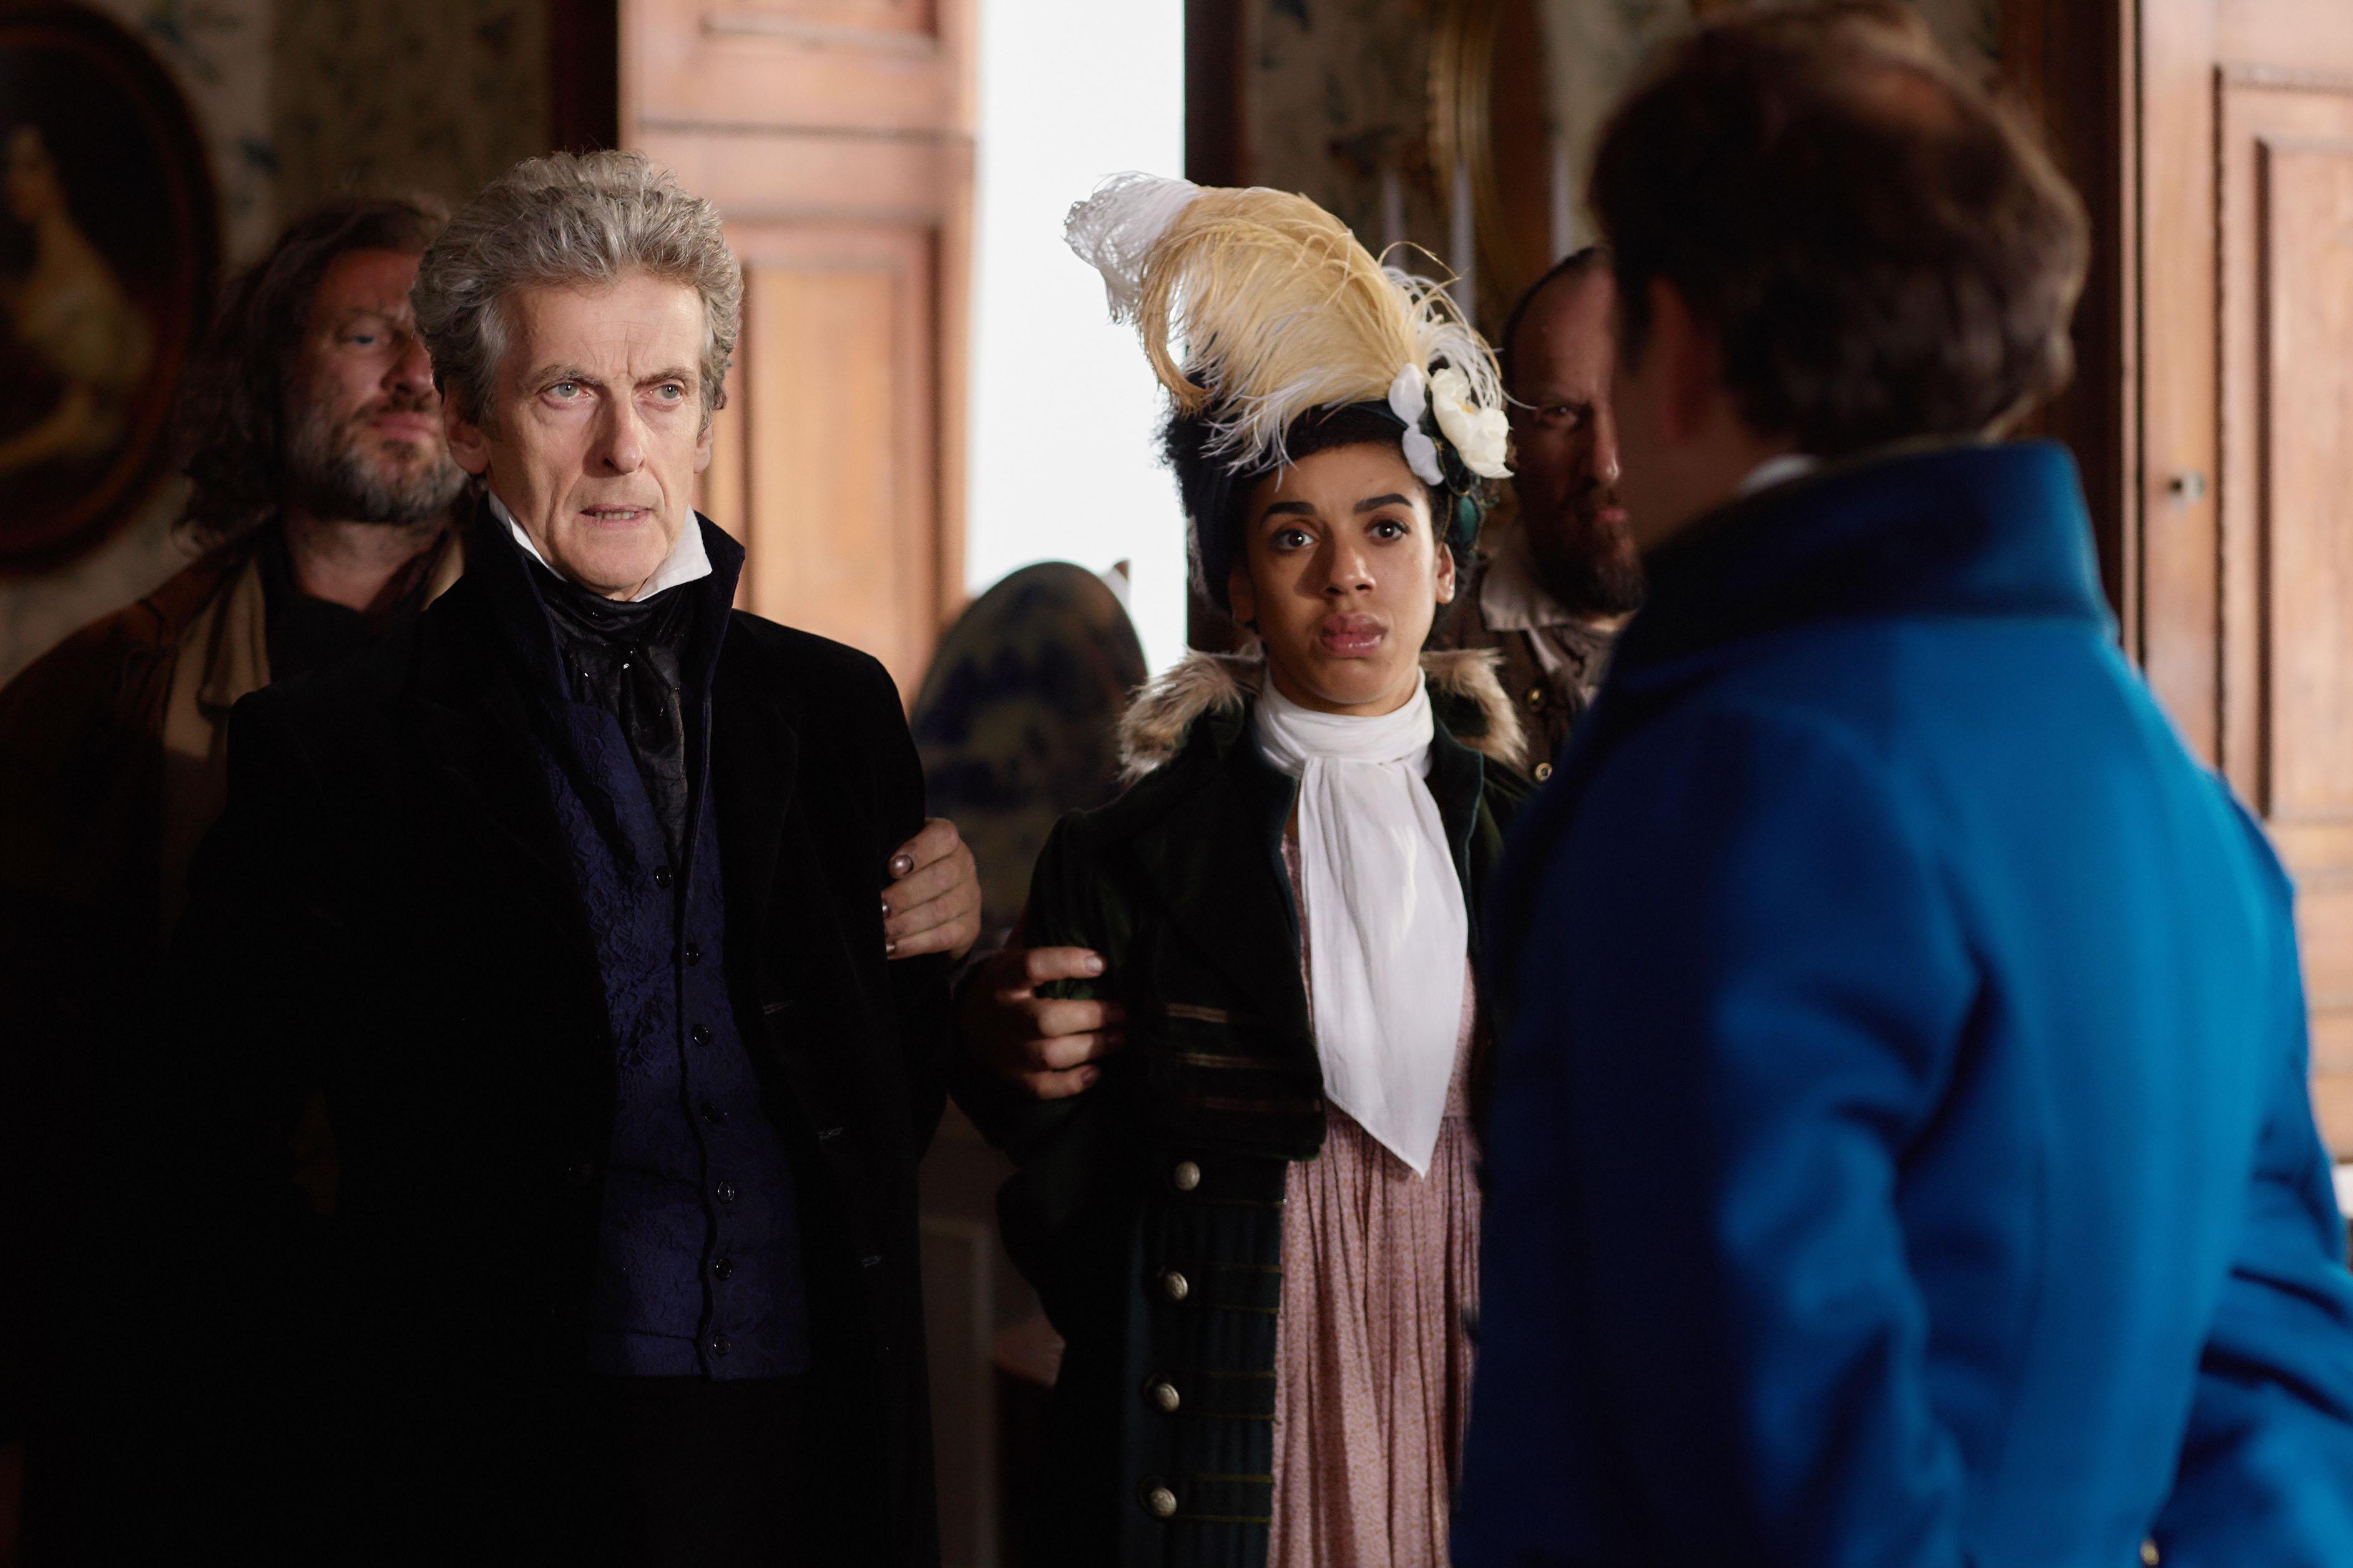 Doctor Who 10 3 main